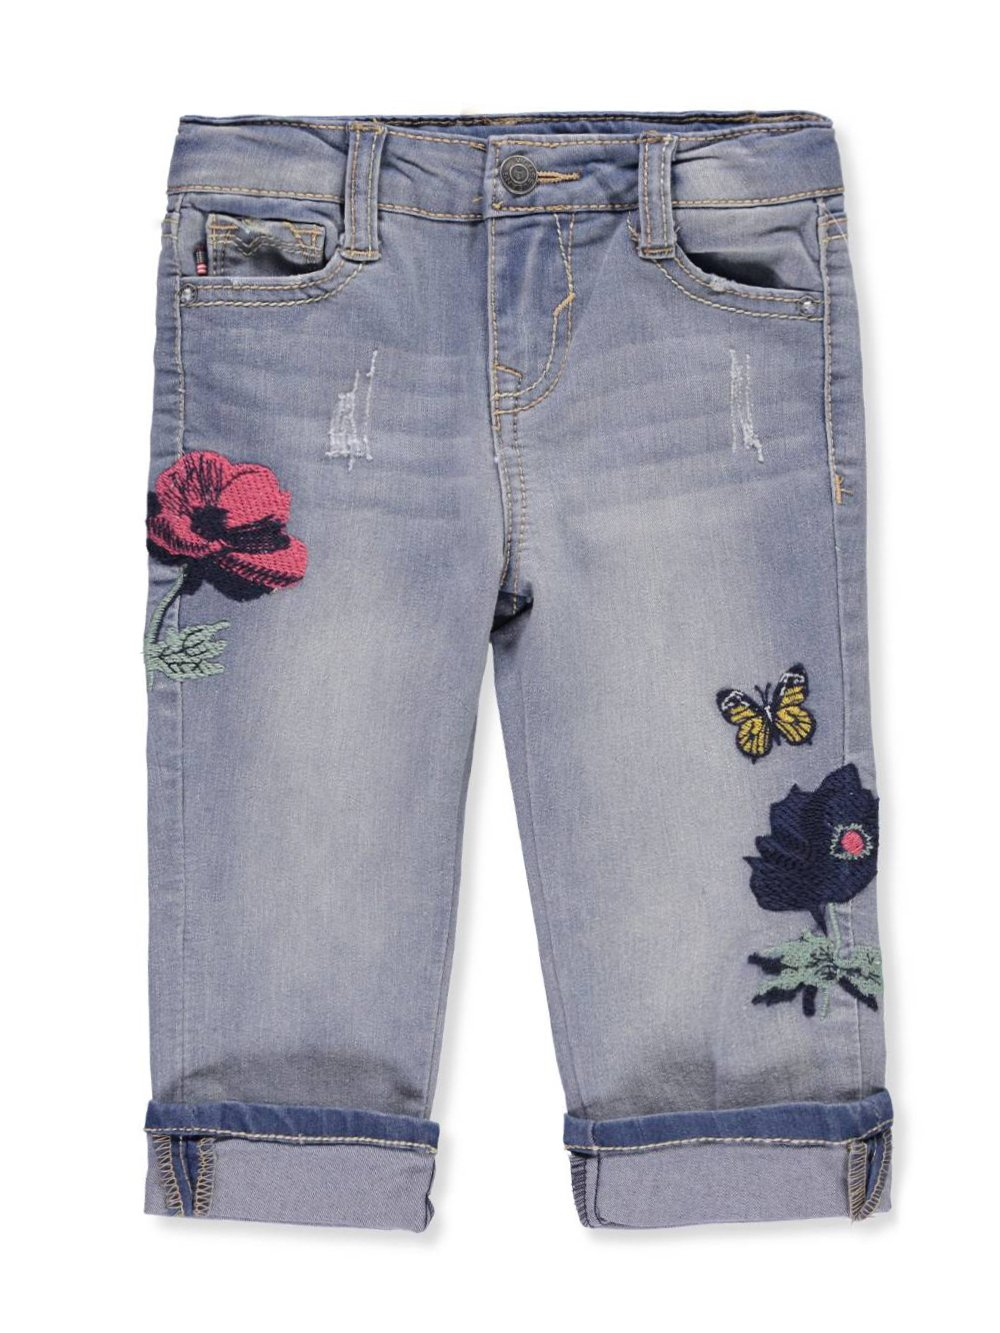 VIGOSS Toddler Girls' Fashion Crop Skinny Jean, Carib Blue, 3T